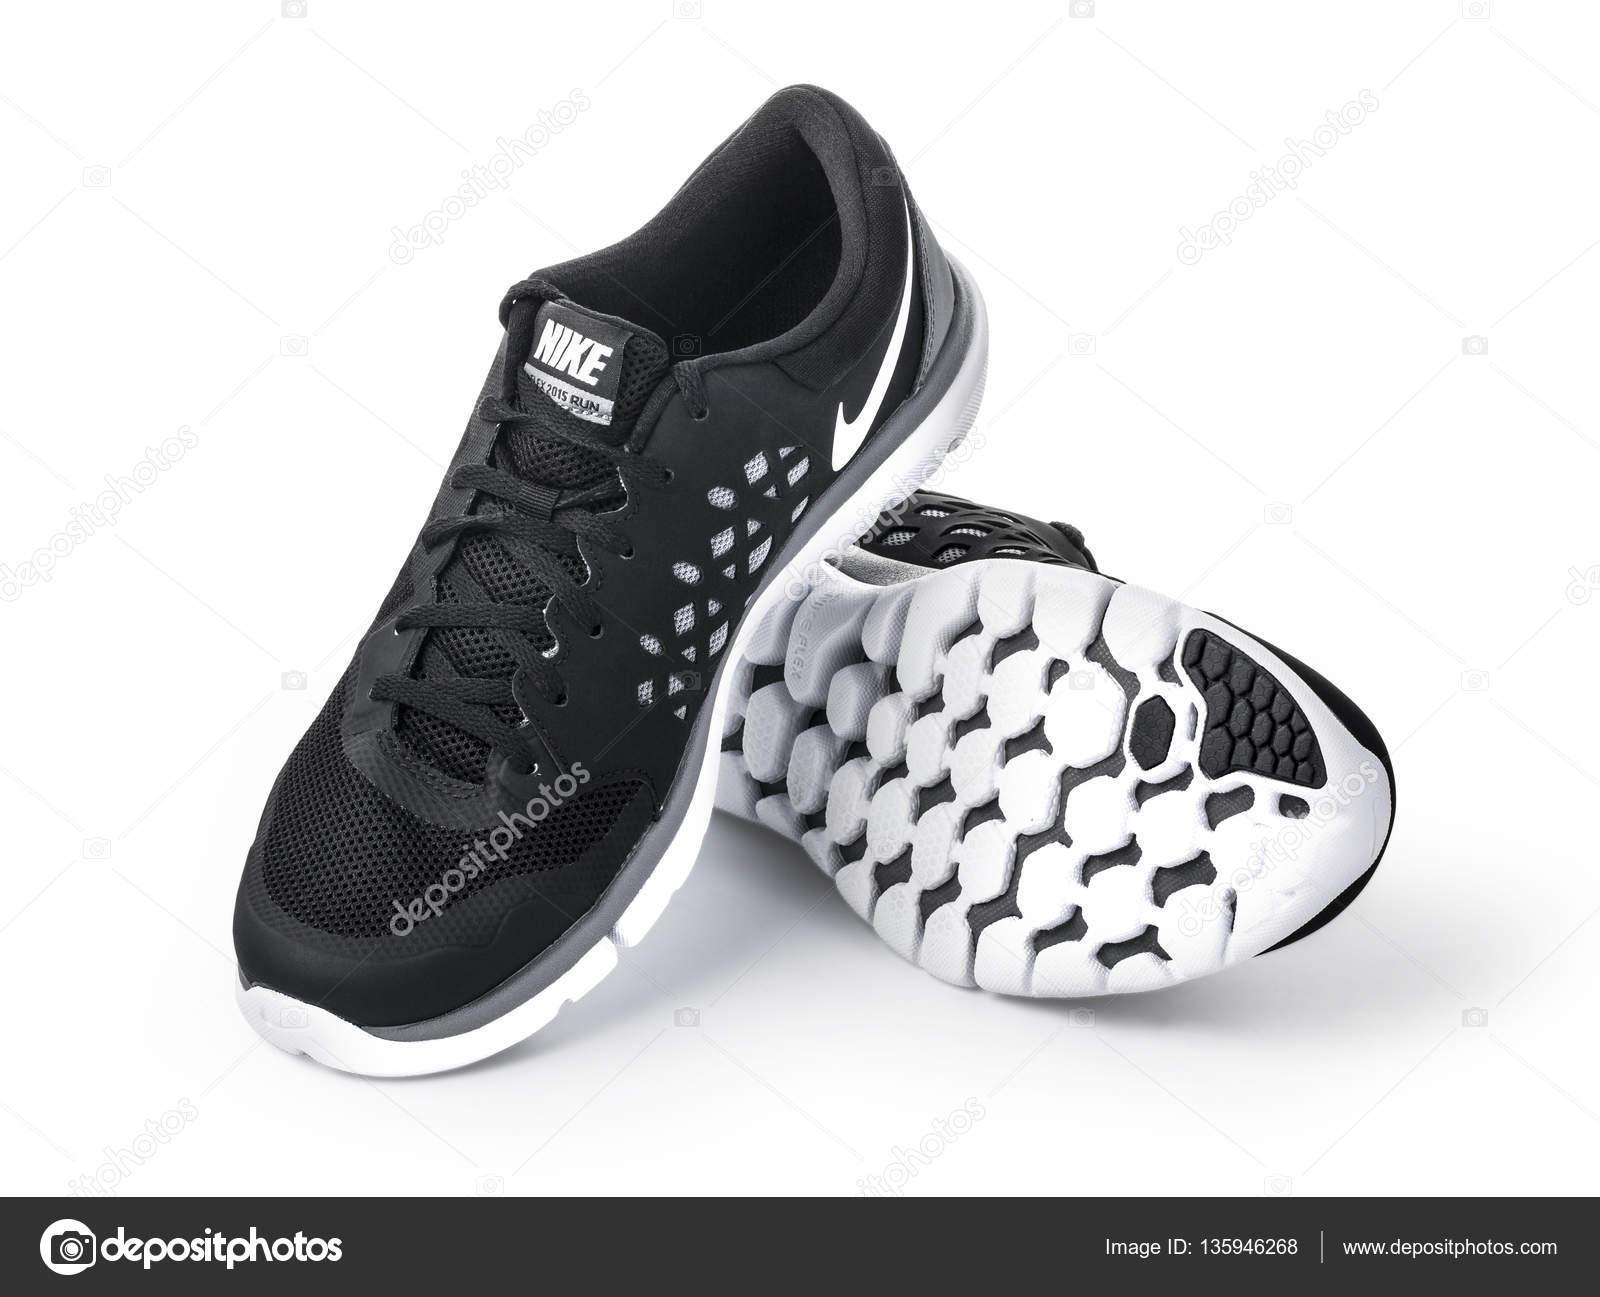 check out 5919a 815ed depositphotos 135946268-stockafbeelding-nieuwe-stijl-nike-schoenen.jpg